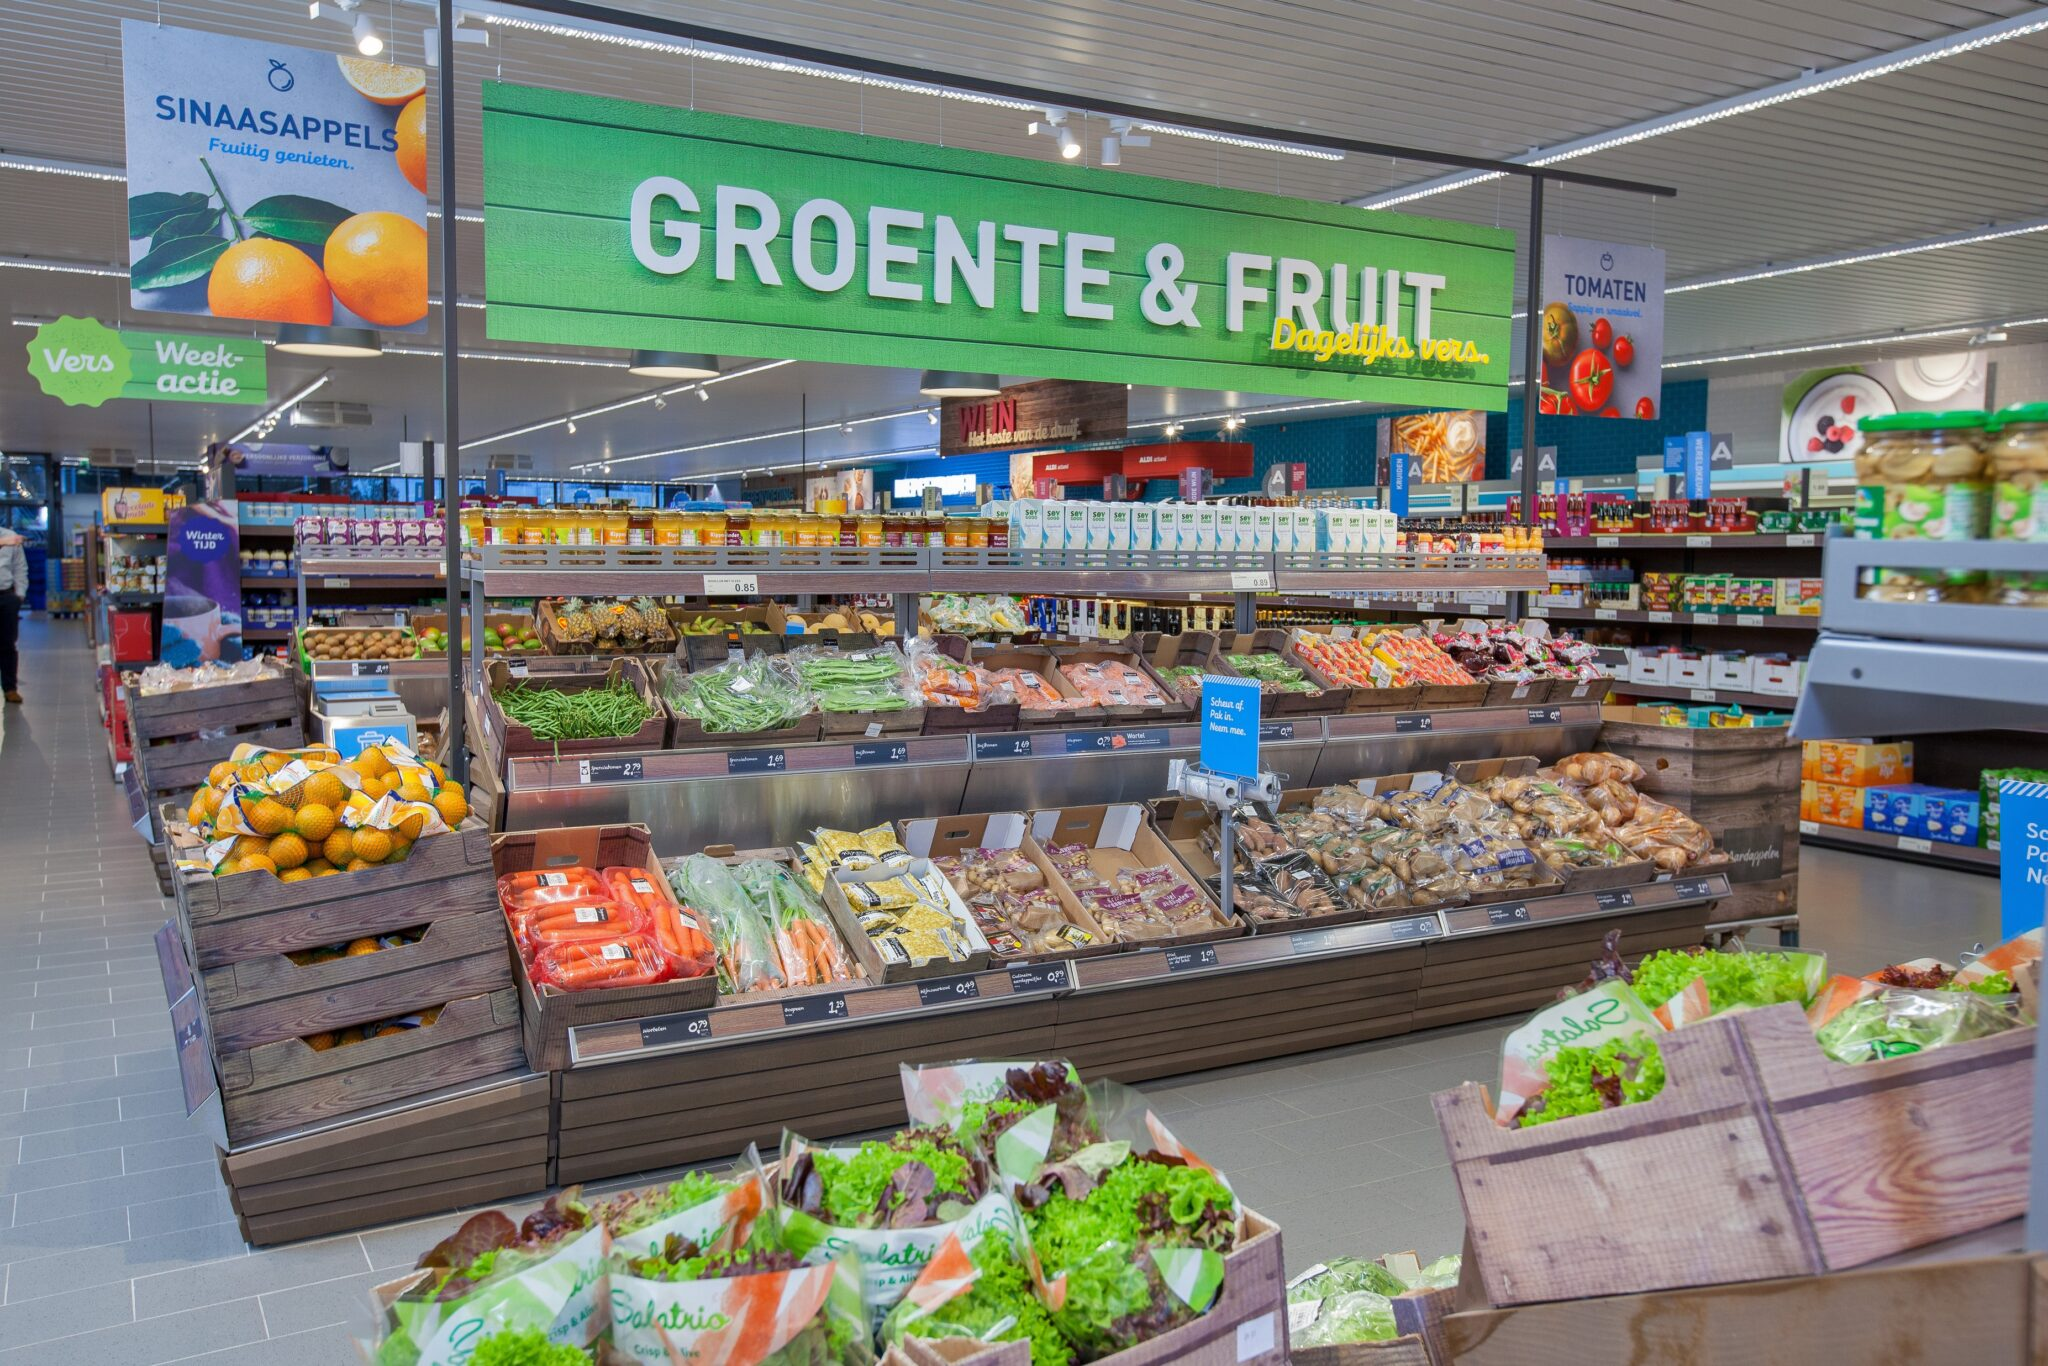 Aldi Harderwijk PC Hooftplein winkelcentrum supermarkt